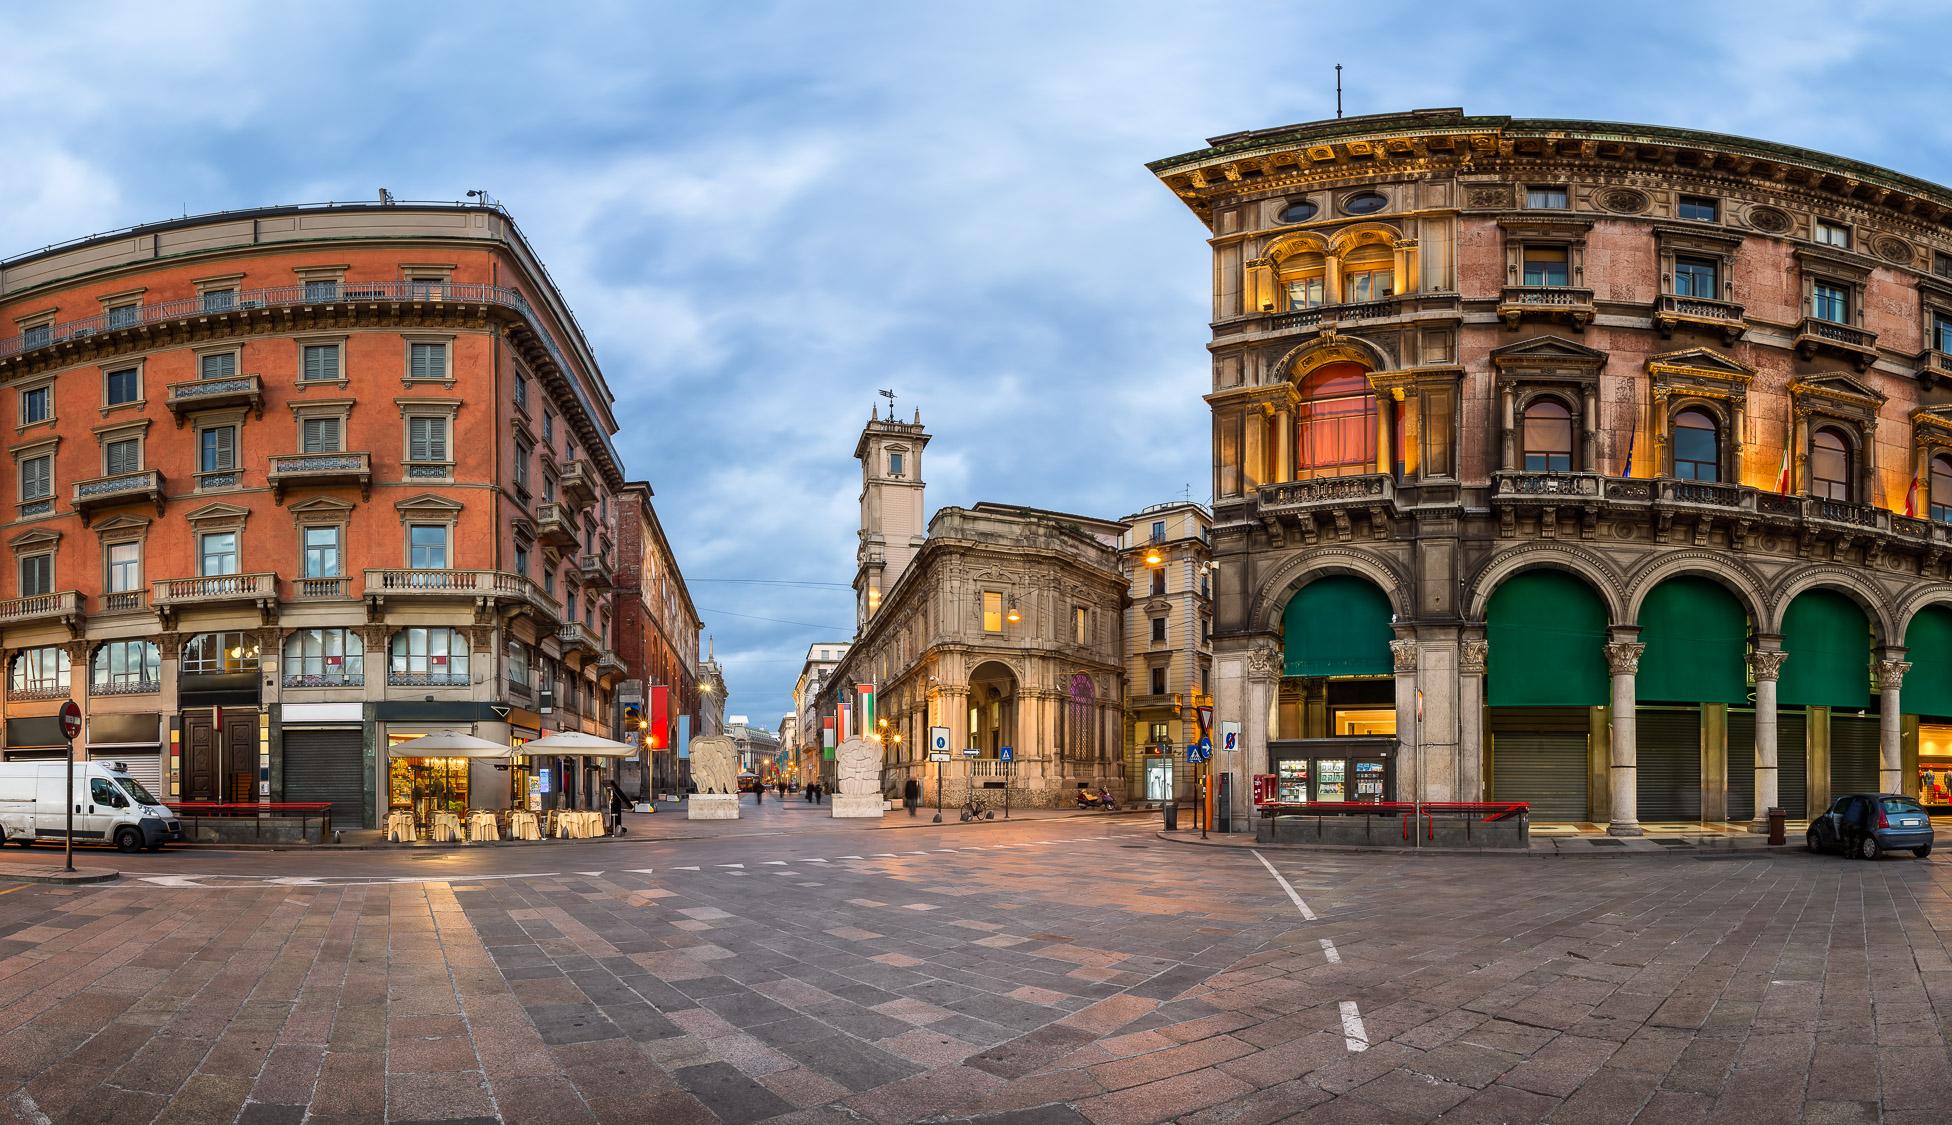 Imagini pentru piazza del duomo milano